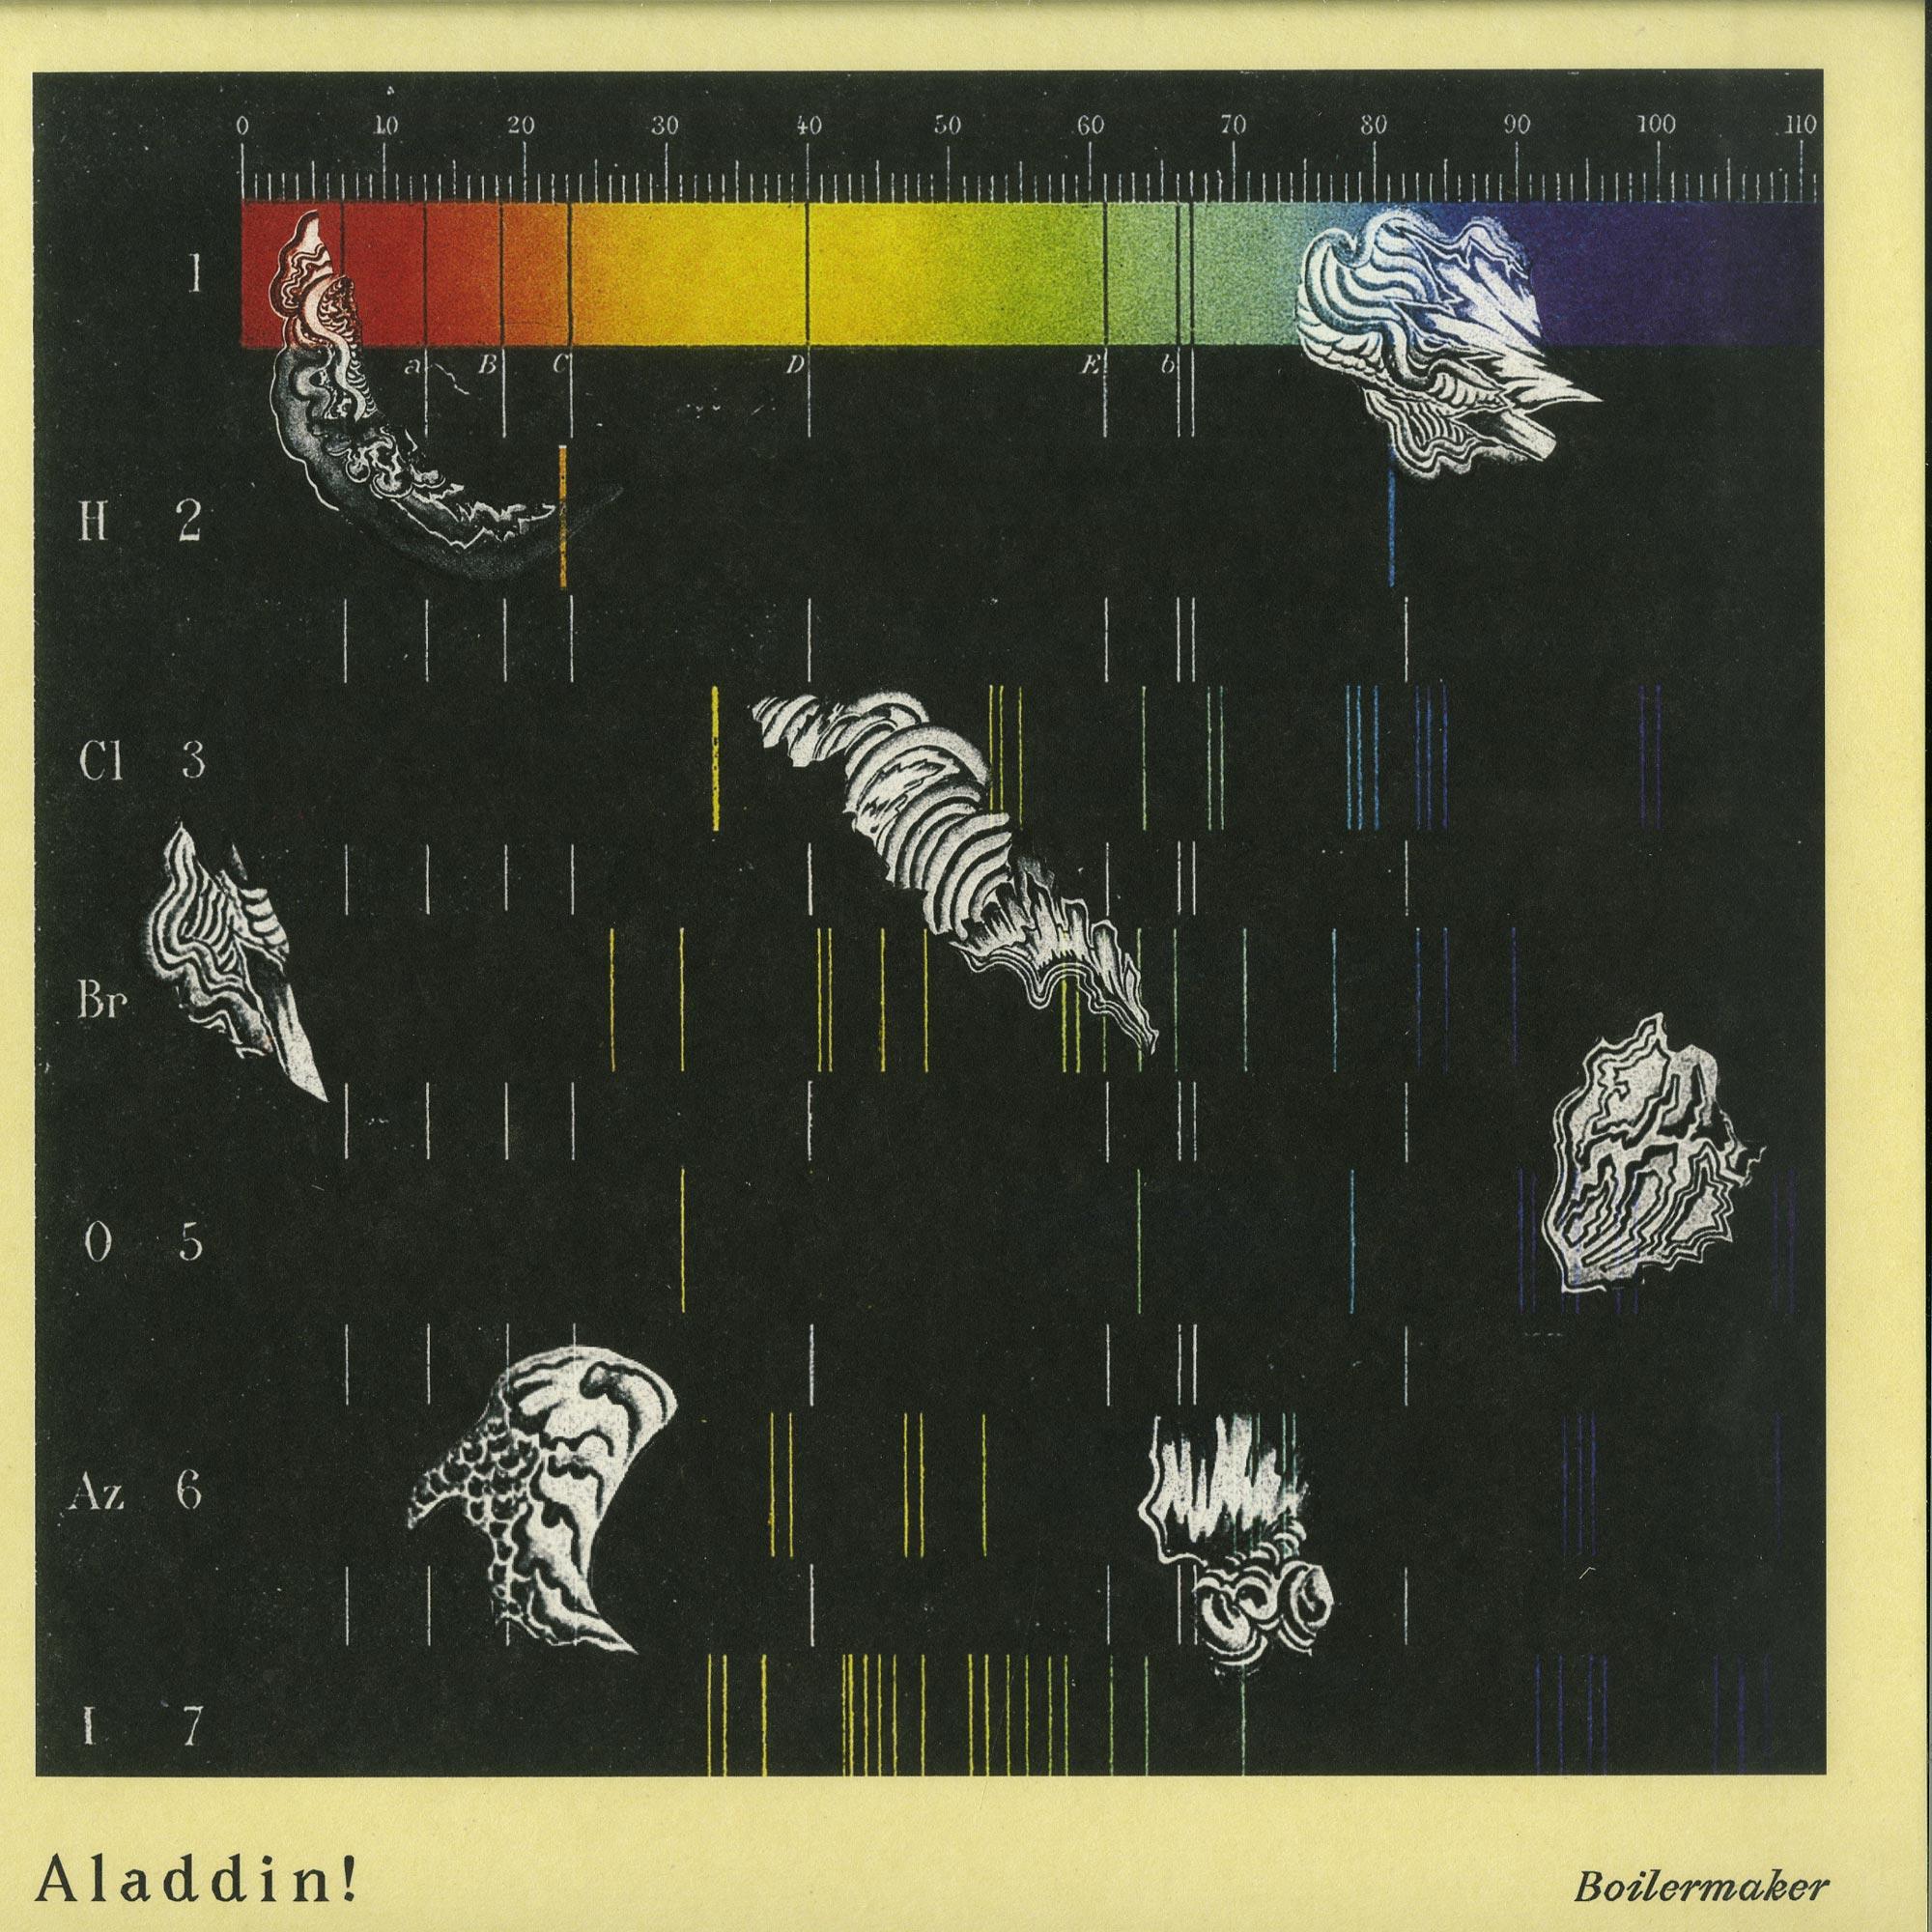 Aladdin! - BOILERMAKER EP